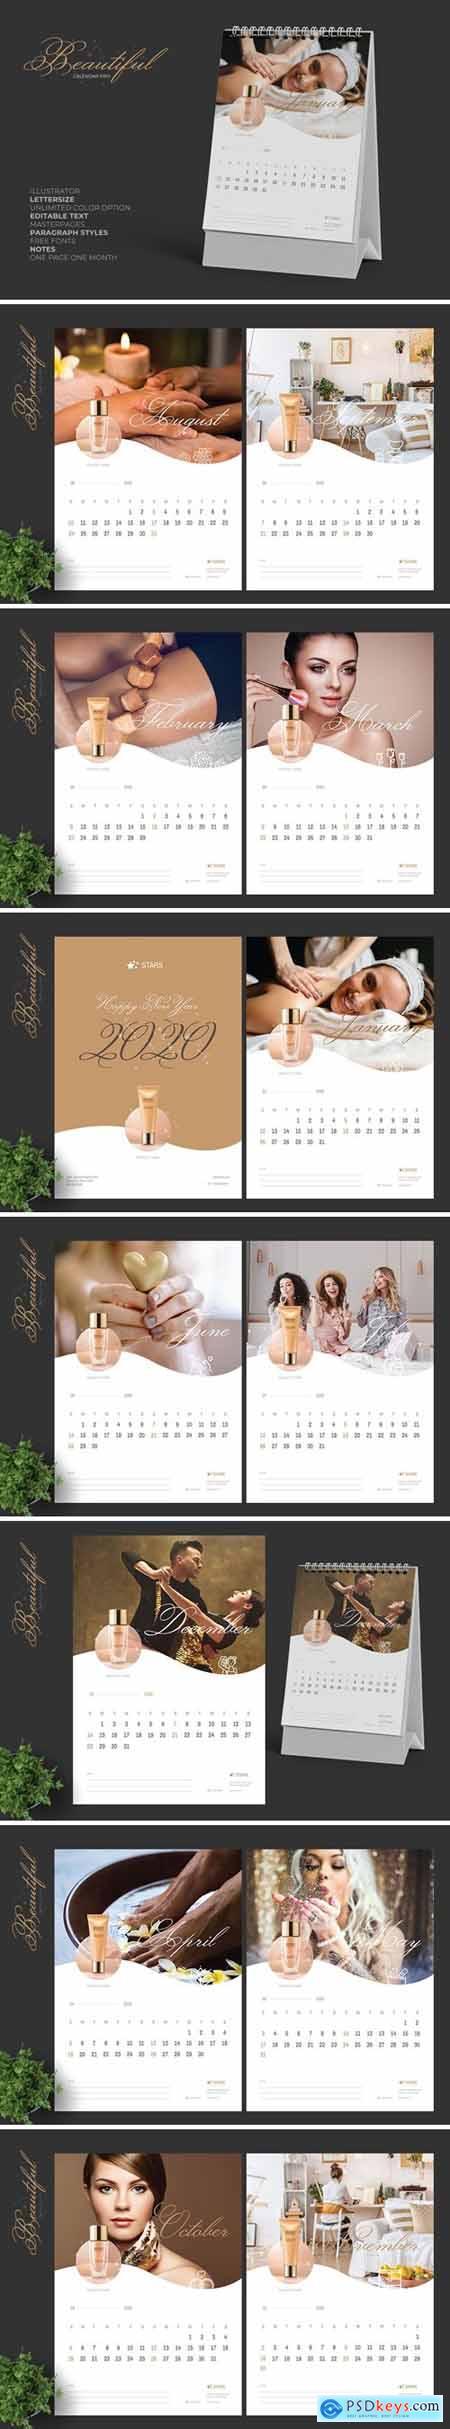 2020 Clean Creative Beauty Calender Pro